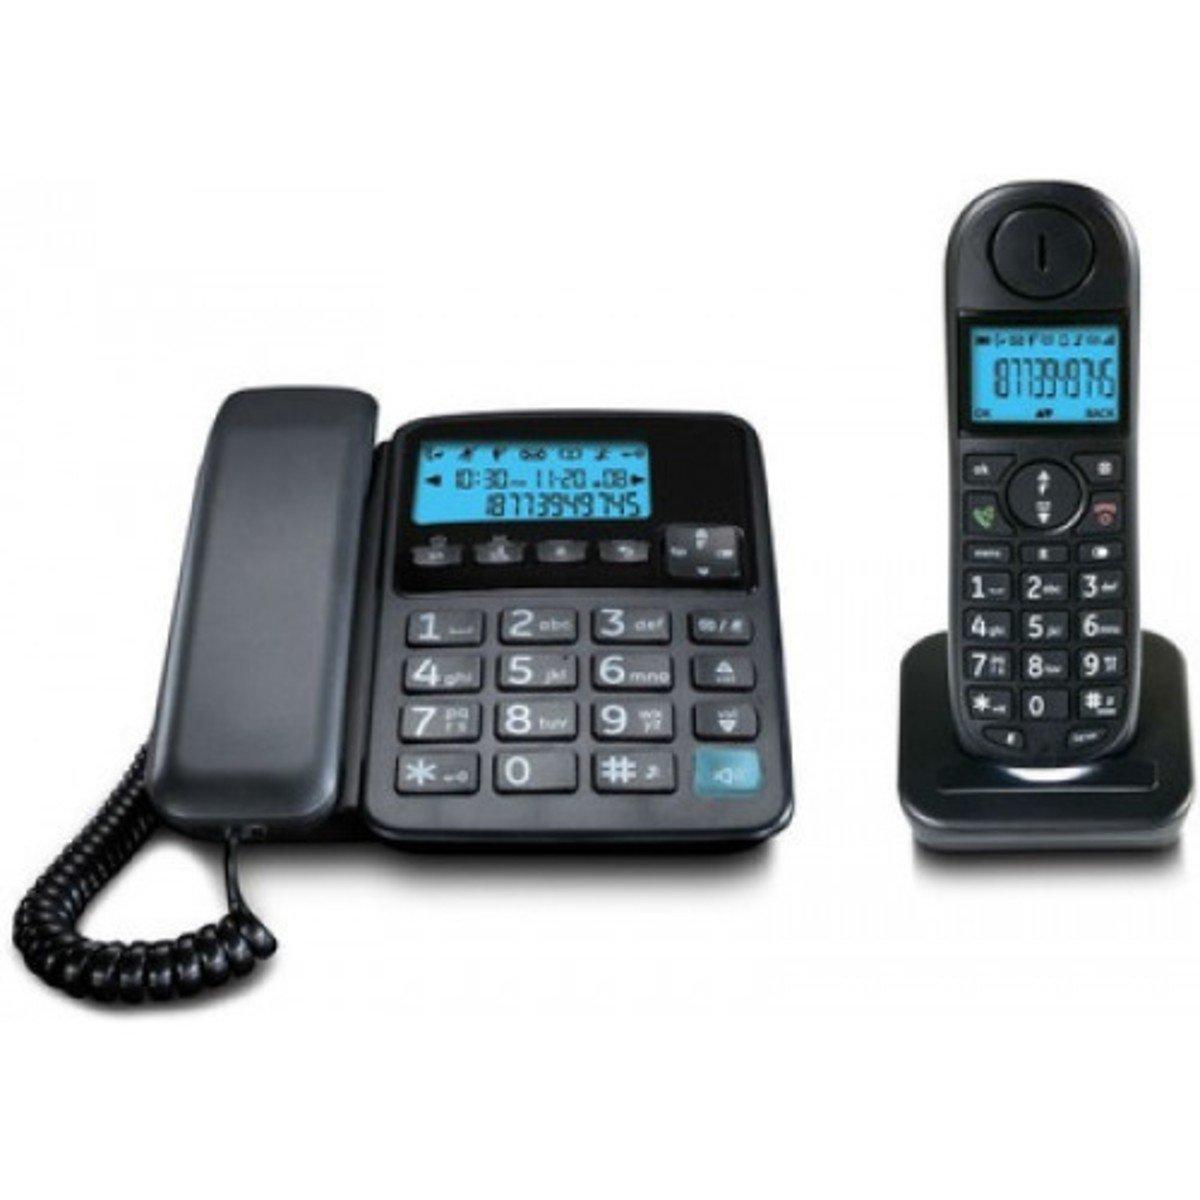 Uniden日本來電顯示免提室內數碼無線電話 , AT4501 黑色